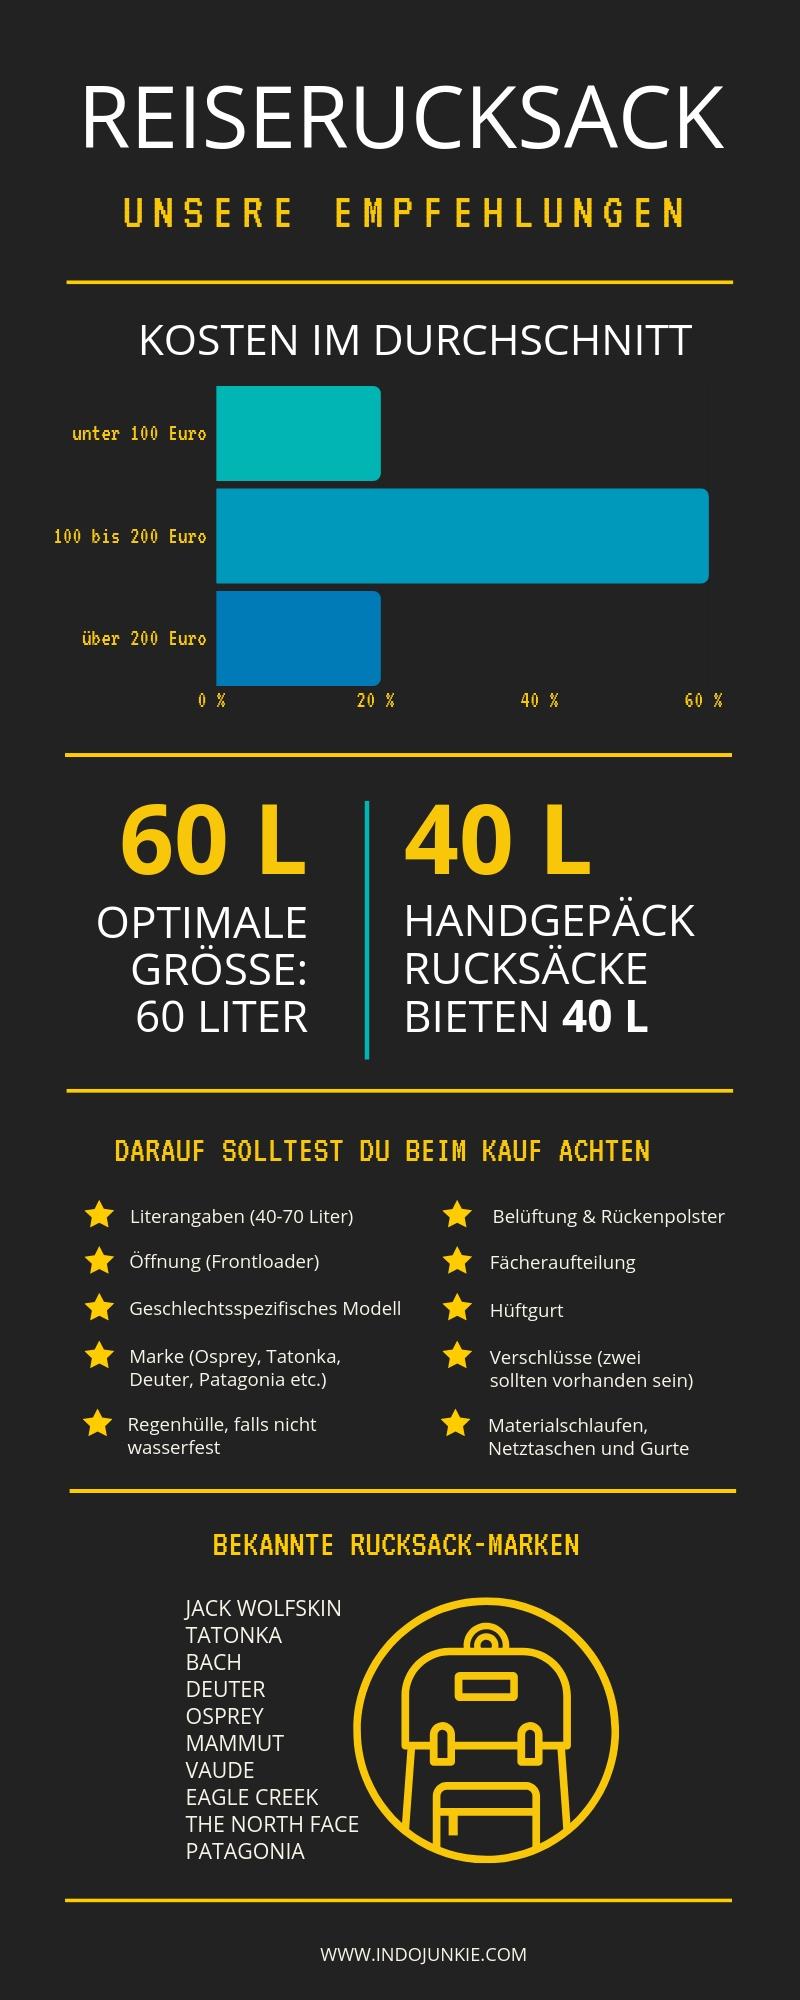 reiserucksack_infografik_indojunkie